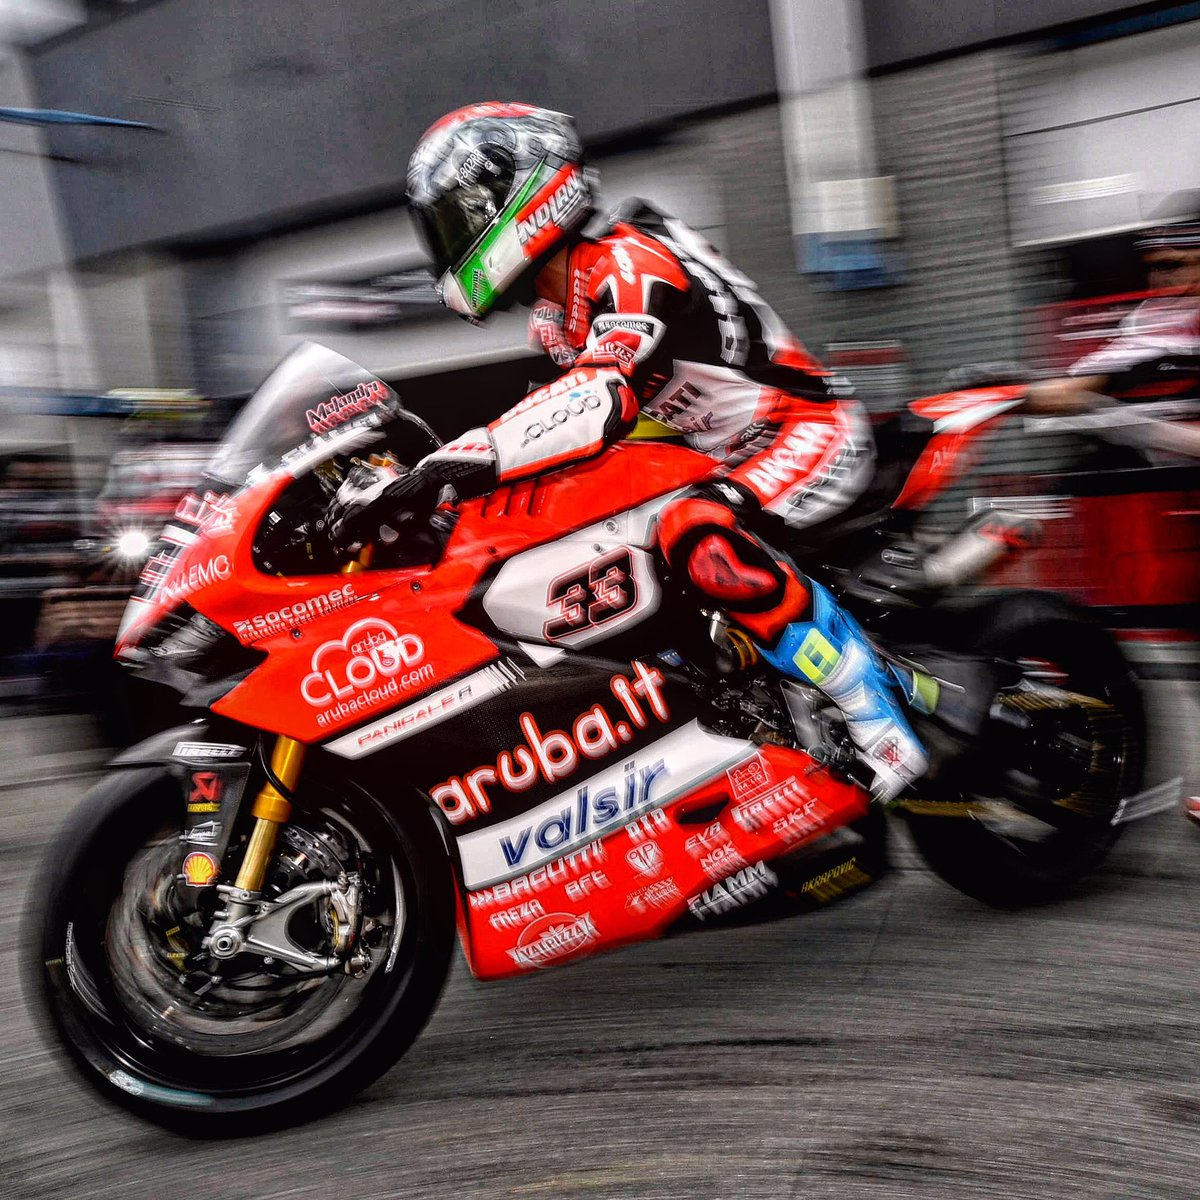 Lucky @MarcoMelandri33 @WorldSBK #DutchWorldSBK @ArubaRacing #speed #bikes #bikers #race #ridetrue #spidiwarrior